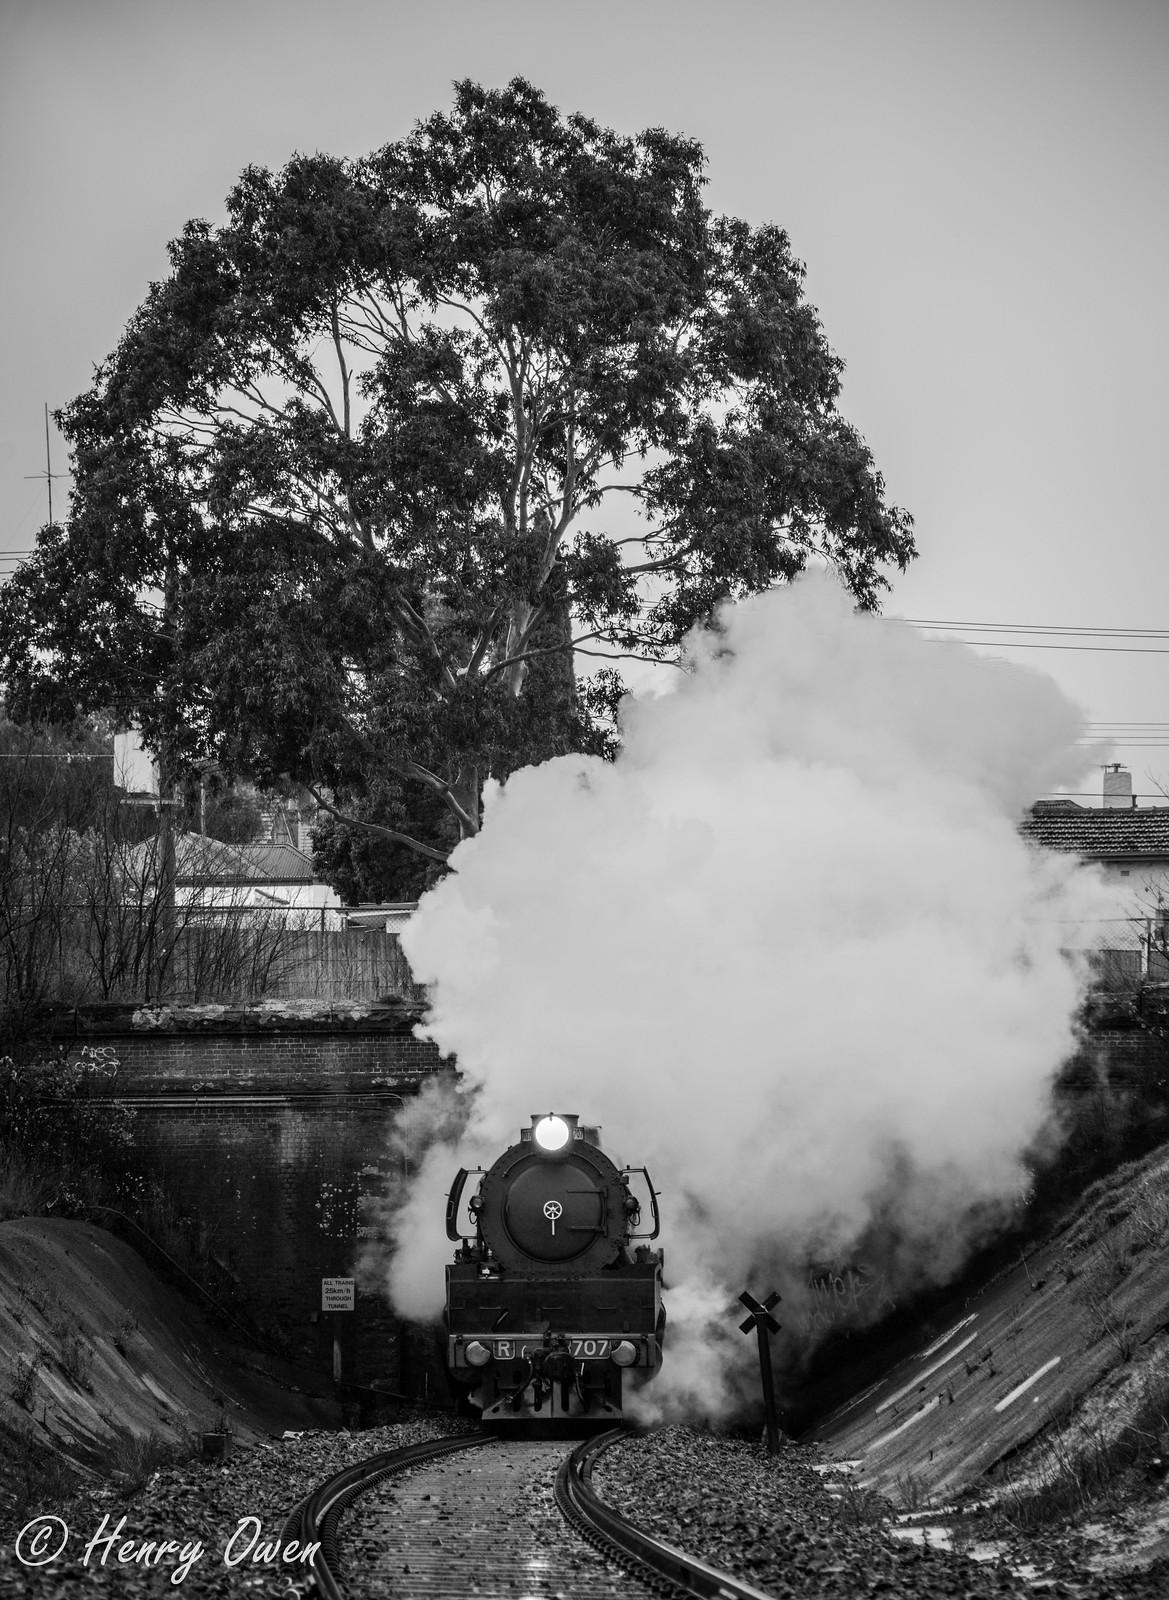 Geelong Tunnel by Henry Owen